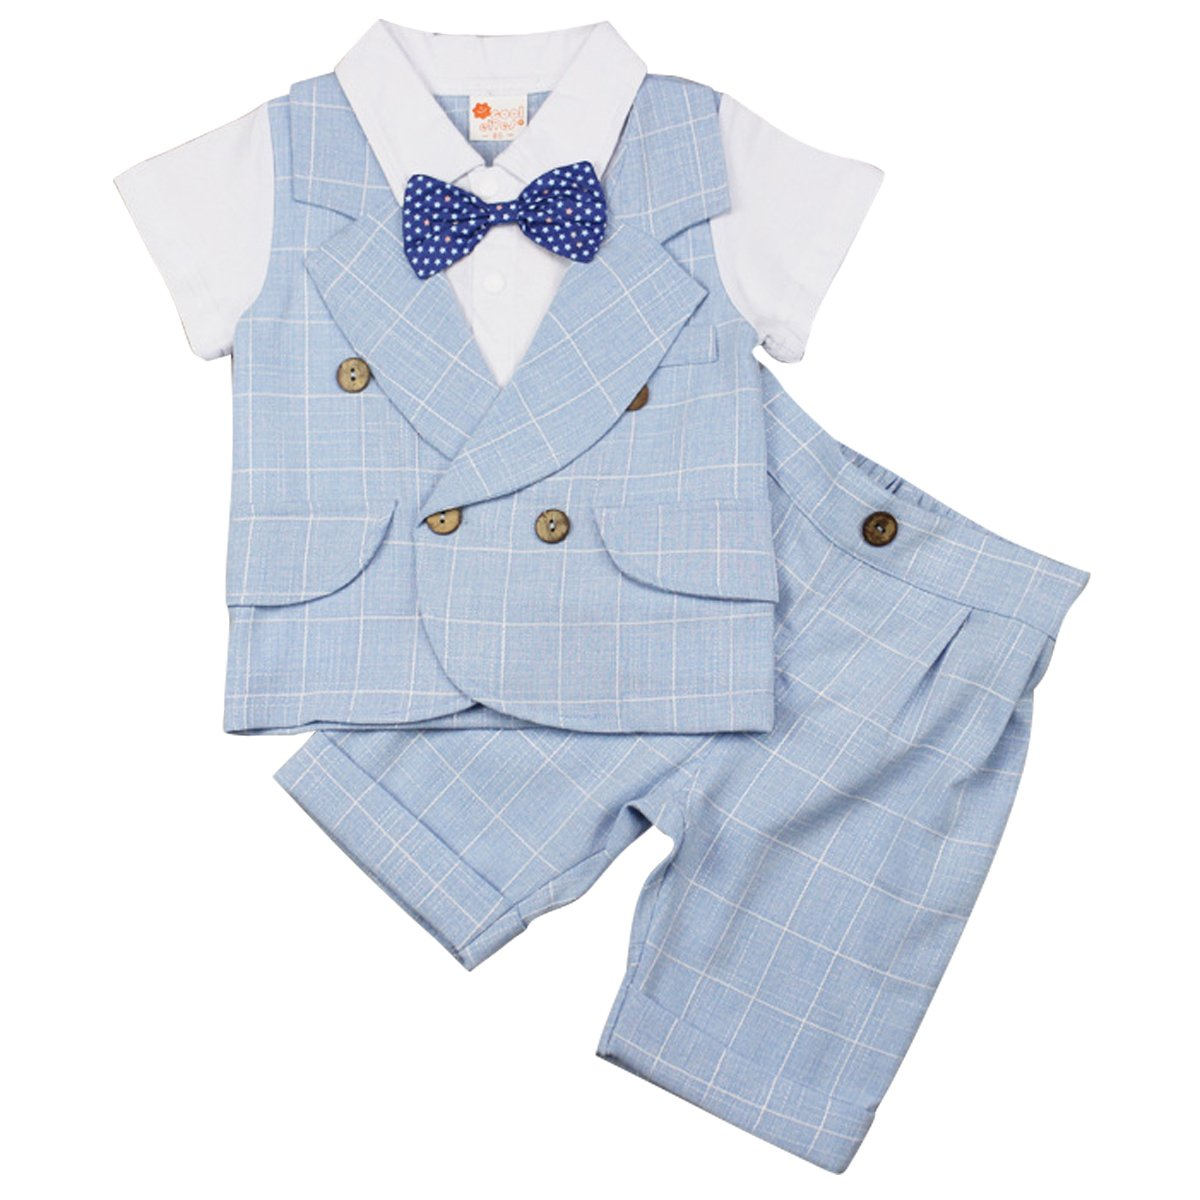 Kanodan Toddler Boy Plaid Gentleman Suits with Bow Summer Shorts Set 1-4Years (Light Blue, 12-18Months)